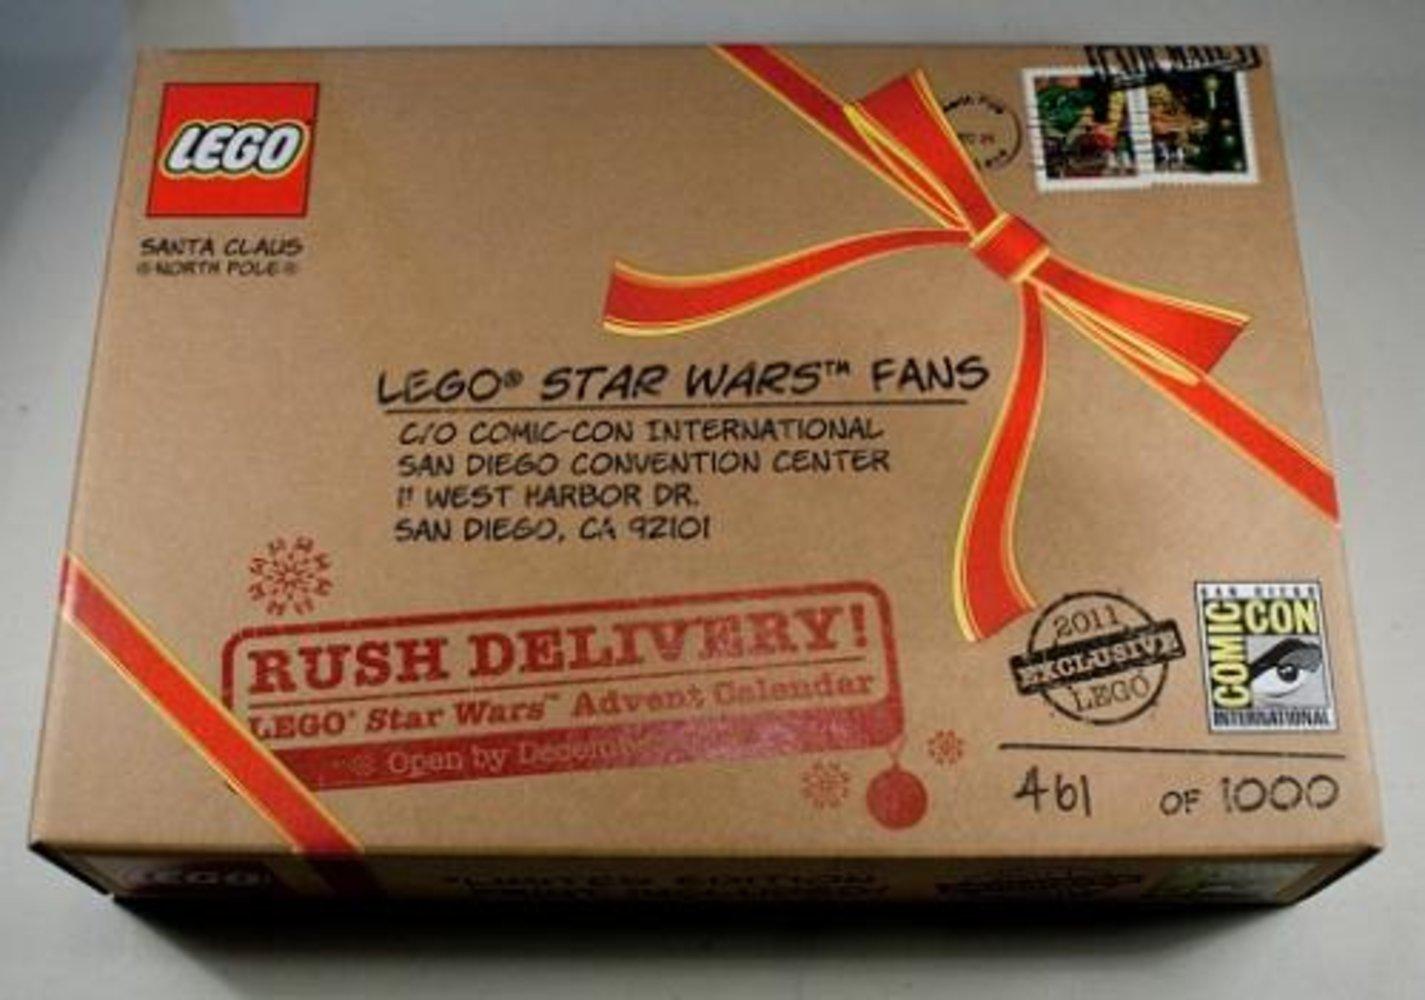 Star Wars Advent Calendar - San Diego Comic-Con 2011 Exclusive